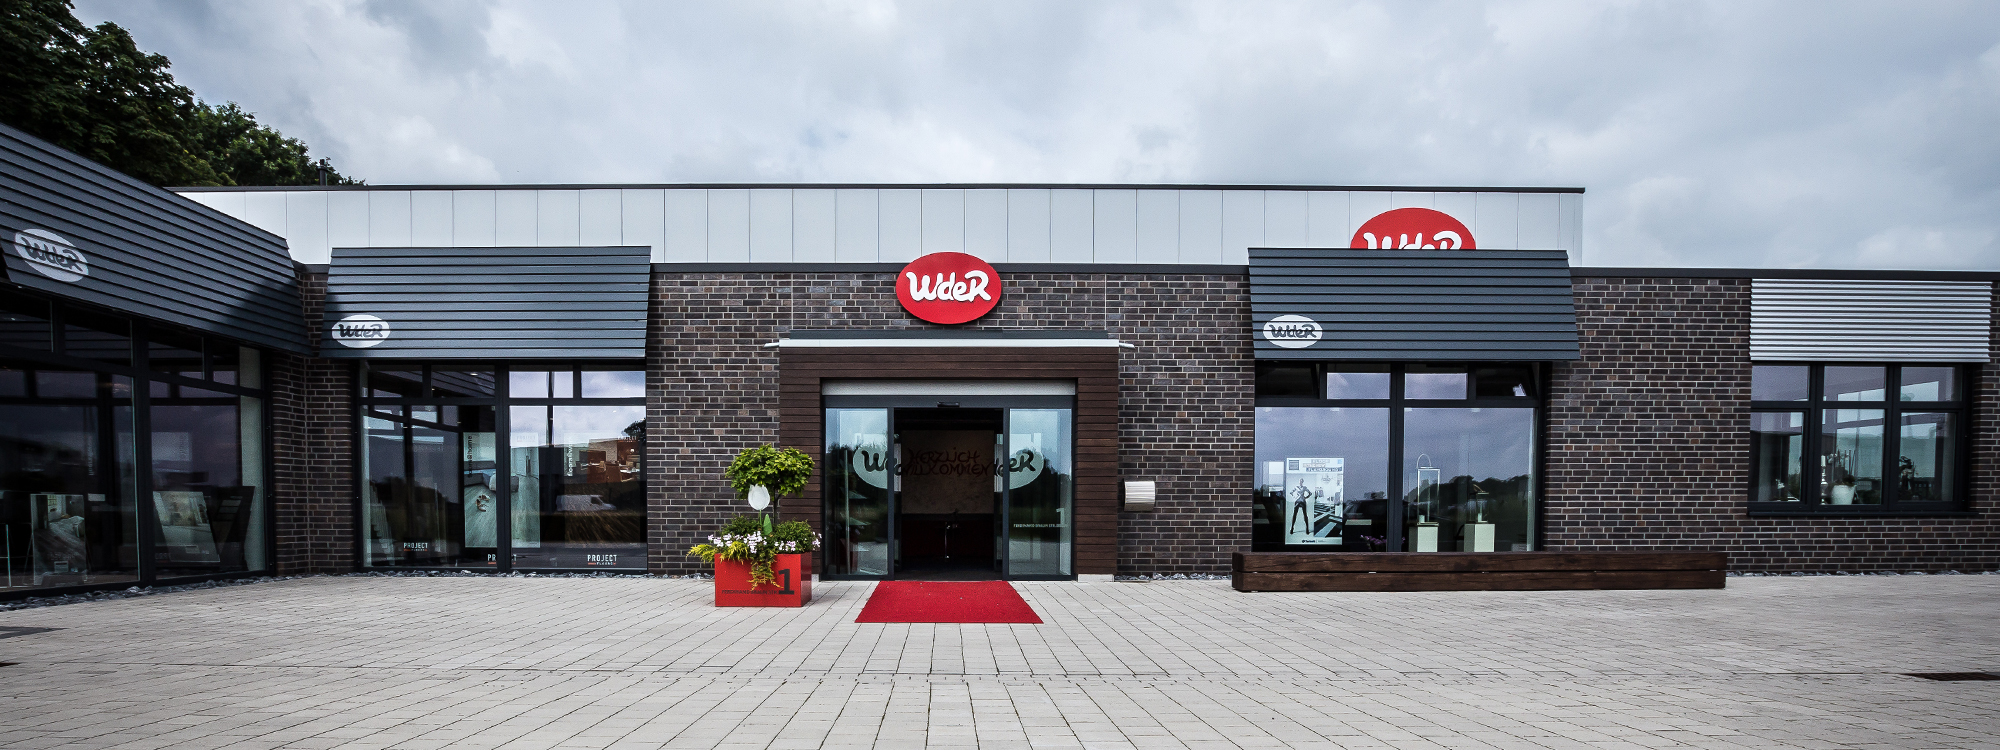 WdeR Fußbodenstudio, Bocholt, Fußbodenspezialist, Fußboden, Parkett, designboden, Holzboden,